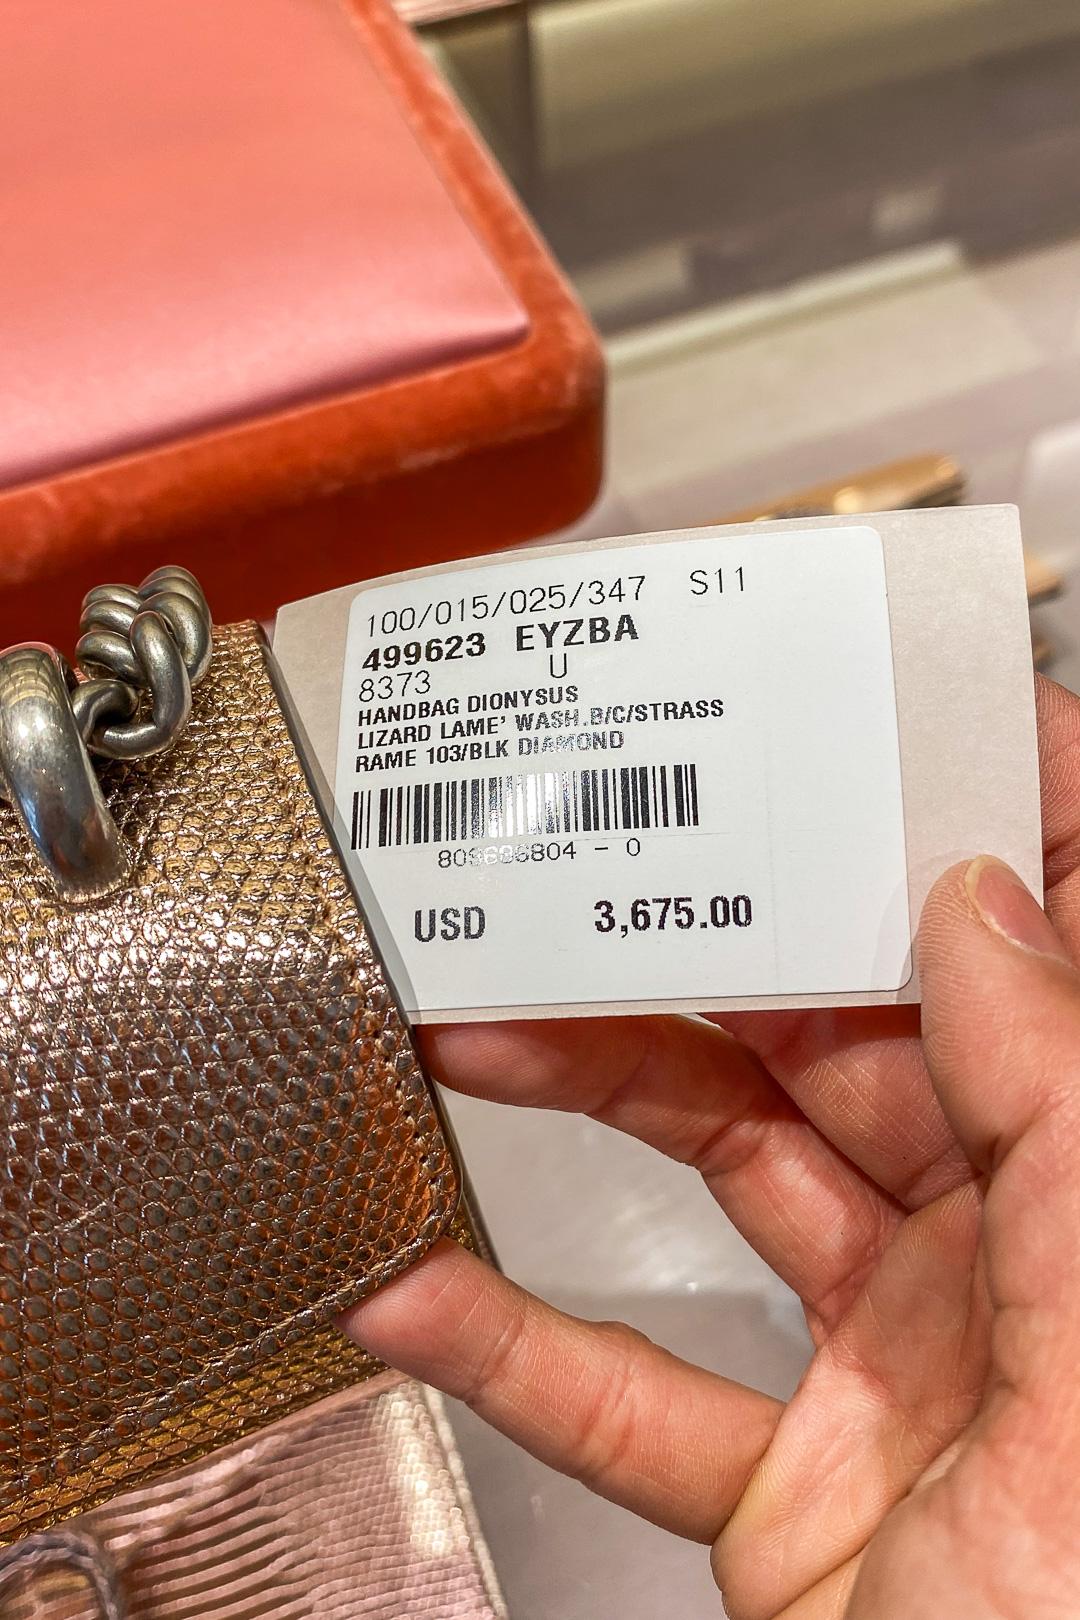 Gucci Hawaii Waikiki Dionysus Metallic Lizard Small Shoulder Bag Price